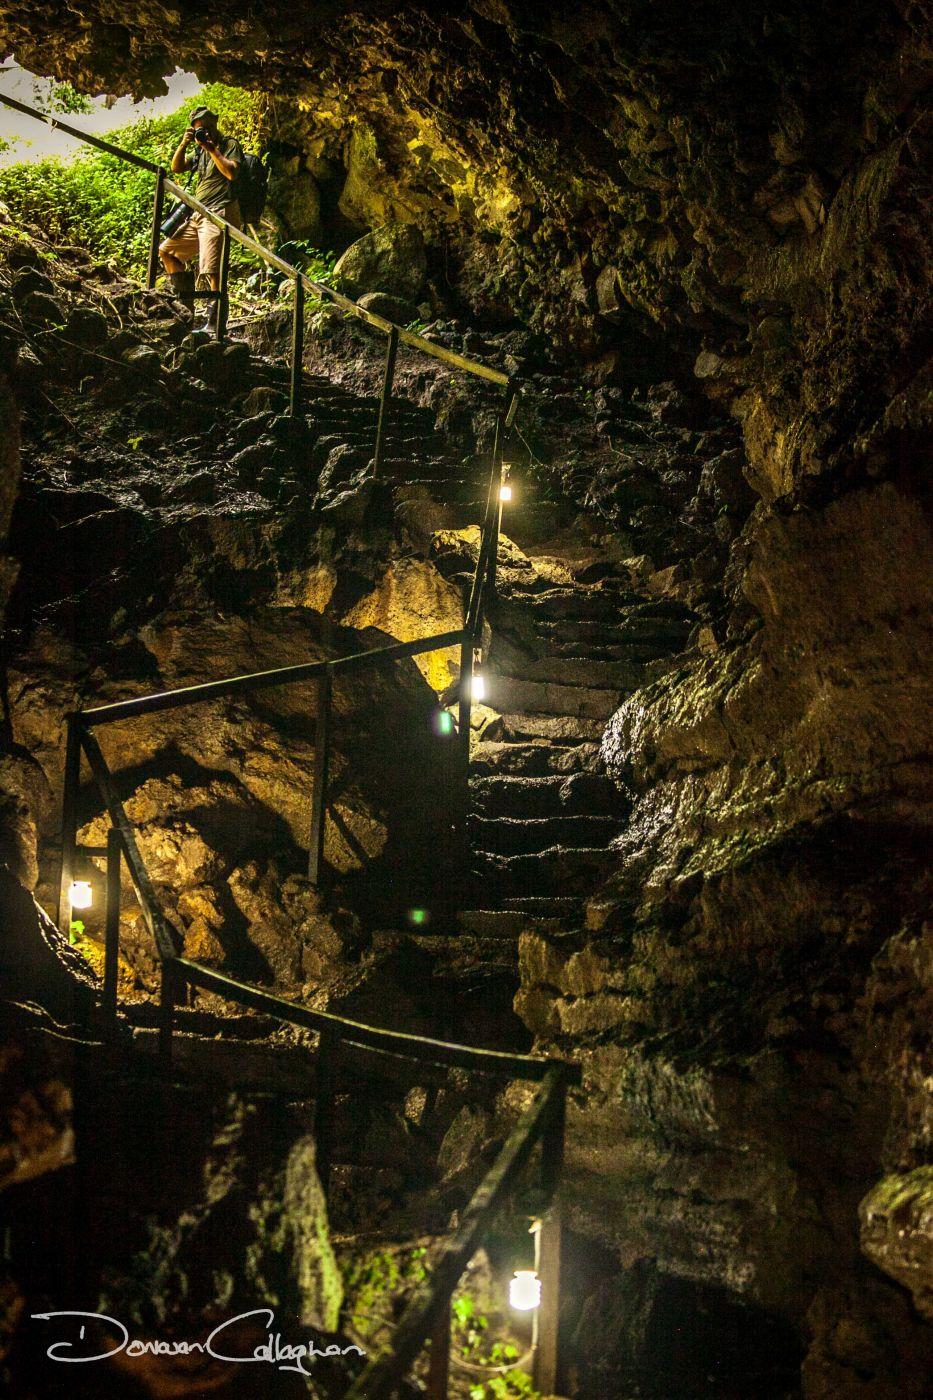 Lava Tube Cave Galapagos Islands, Ecuador